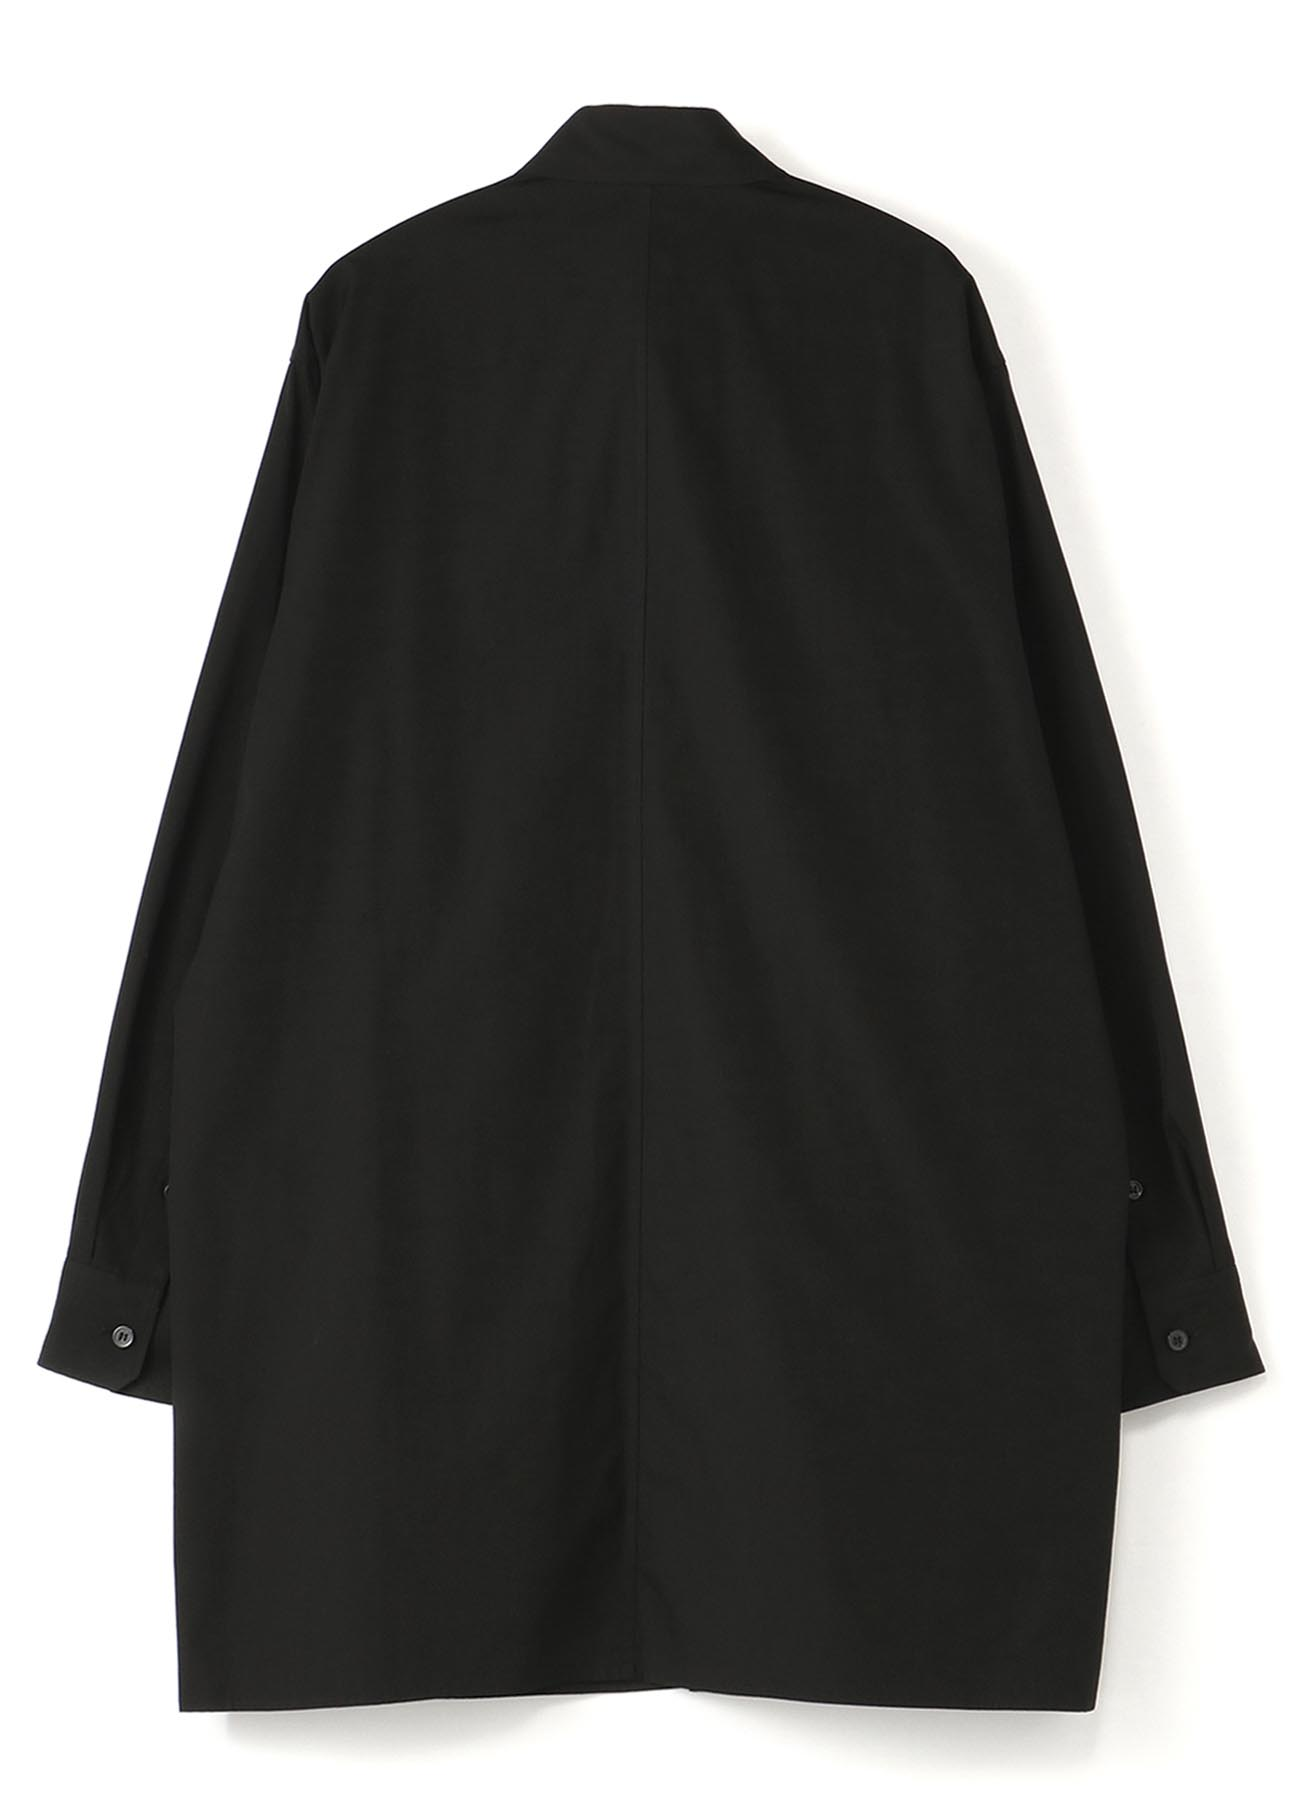 100/2 BROAD DECO CLOTH BLOUSE